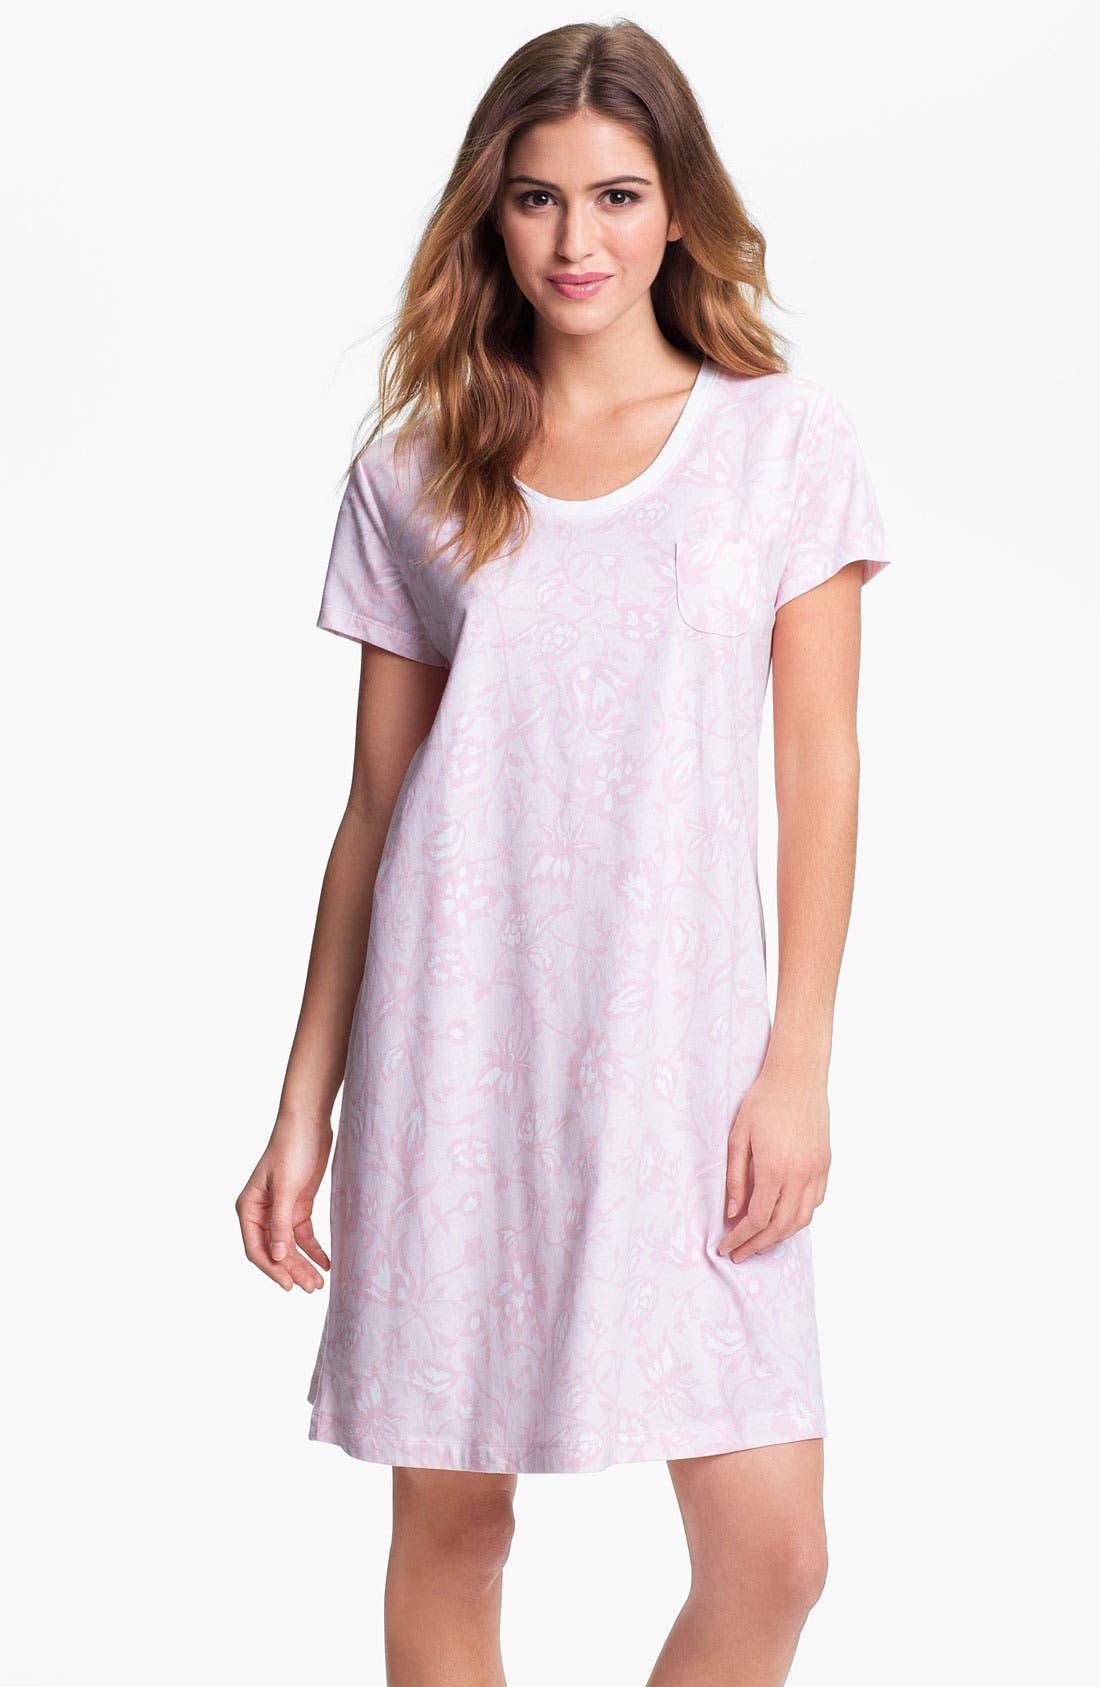 Alternate Image 1 Selected - Carole Hochman Designs Short Sleeve Sleep Shirt